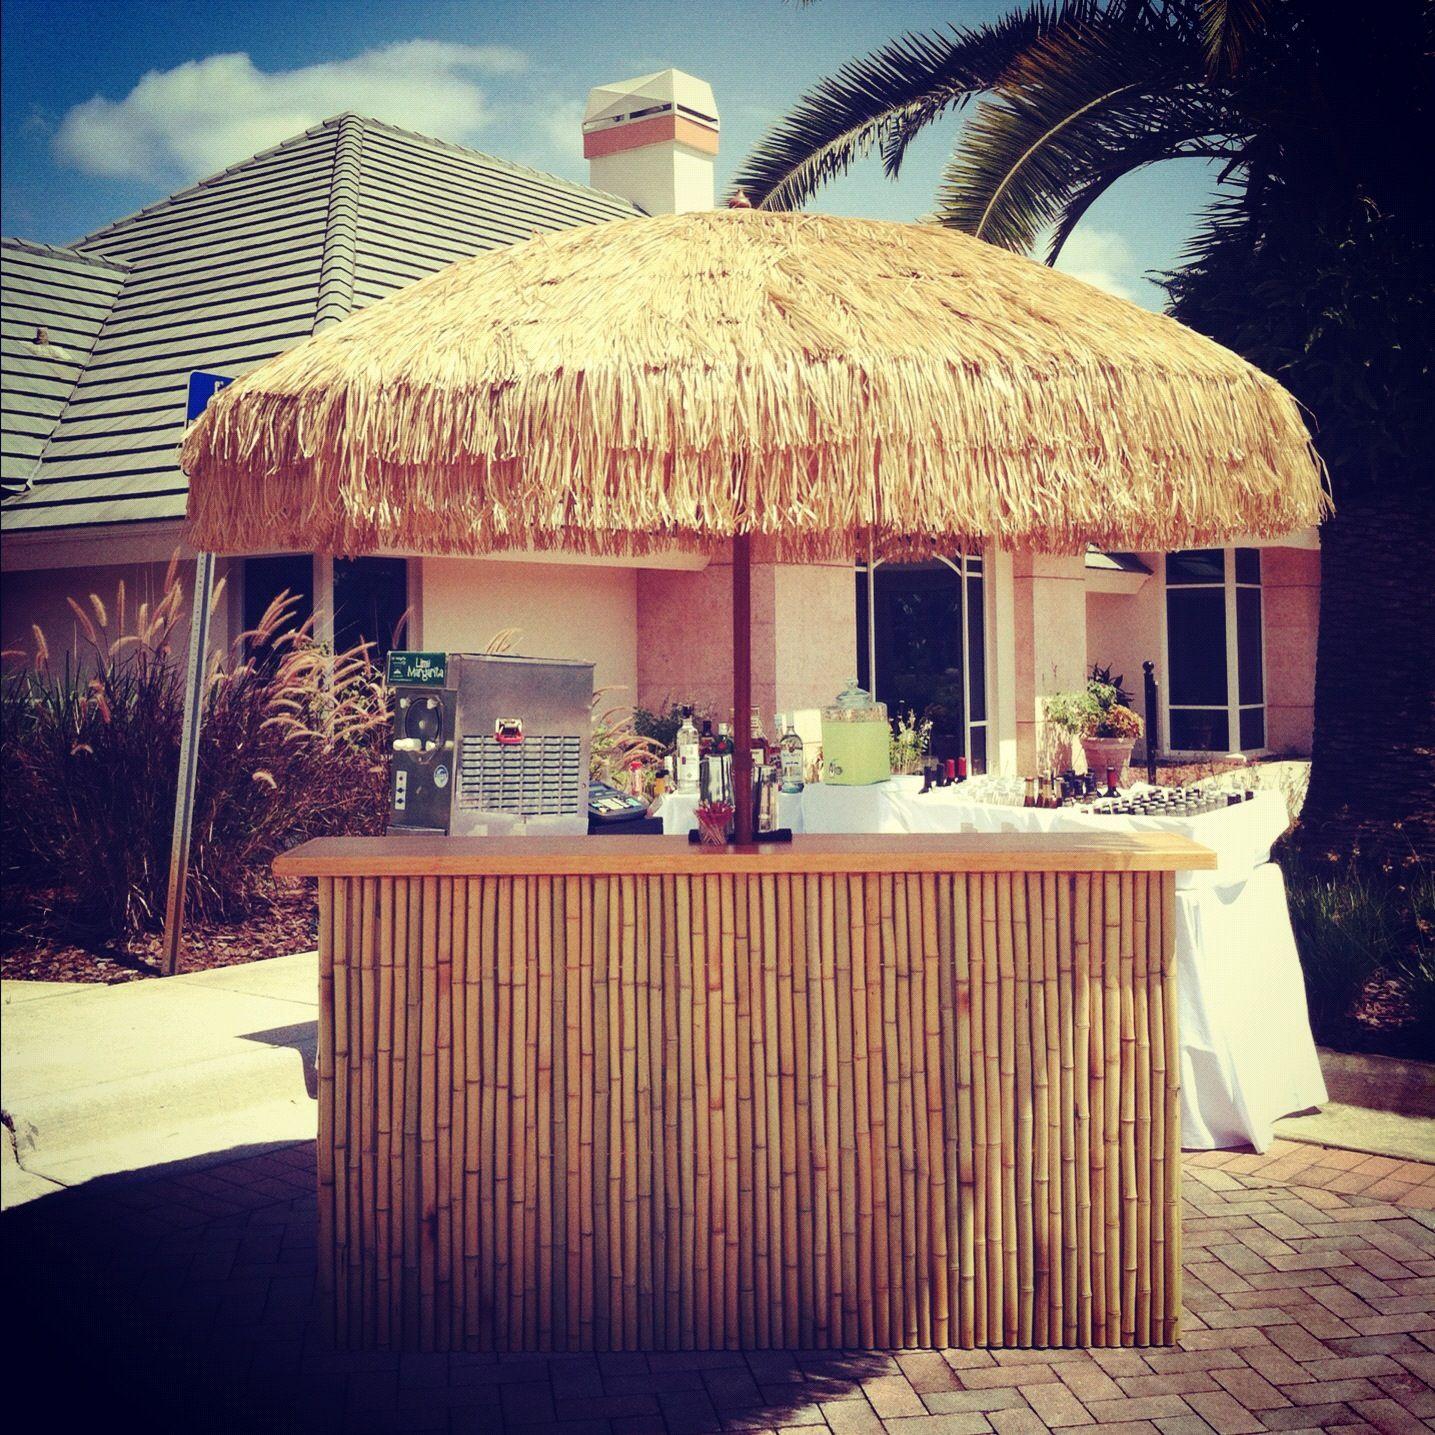 Our Custom Bamboo Tiki Bar And Umbrella Perfect For